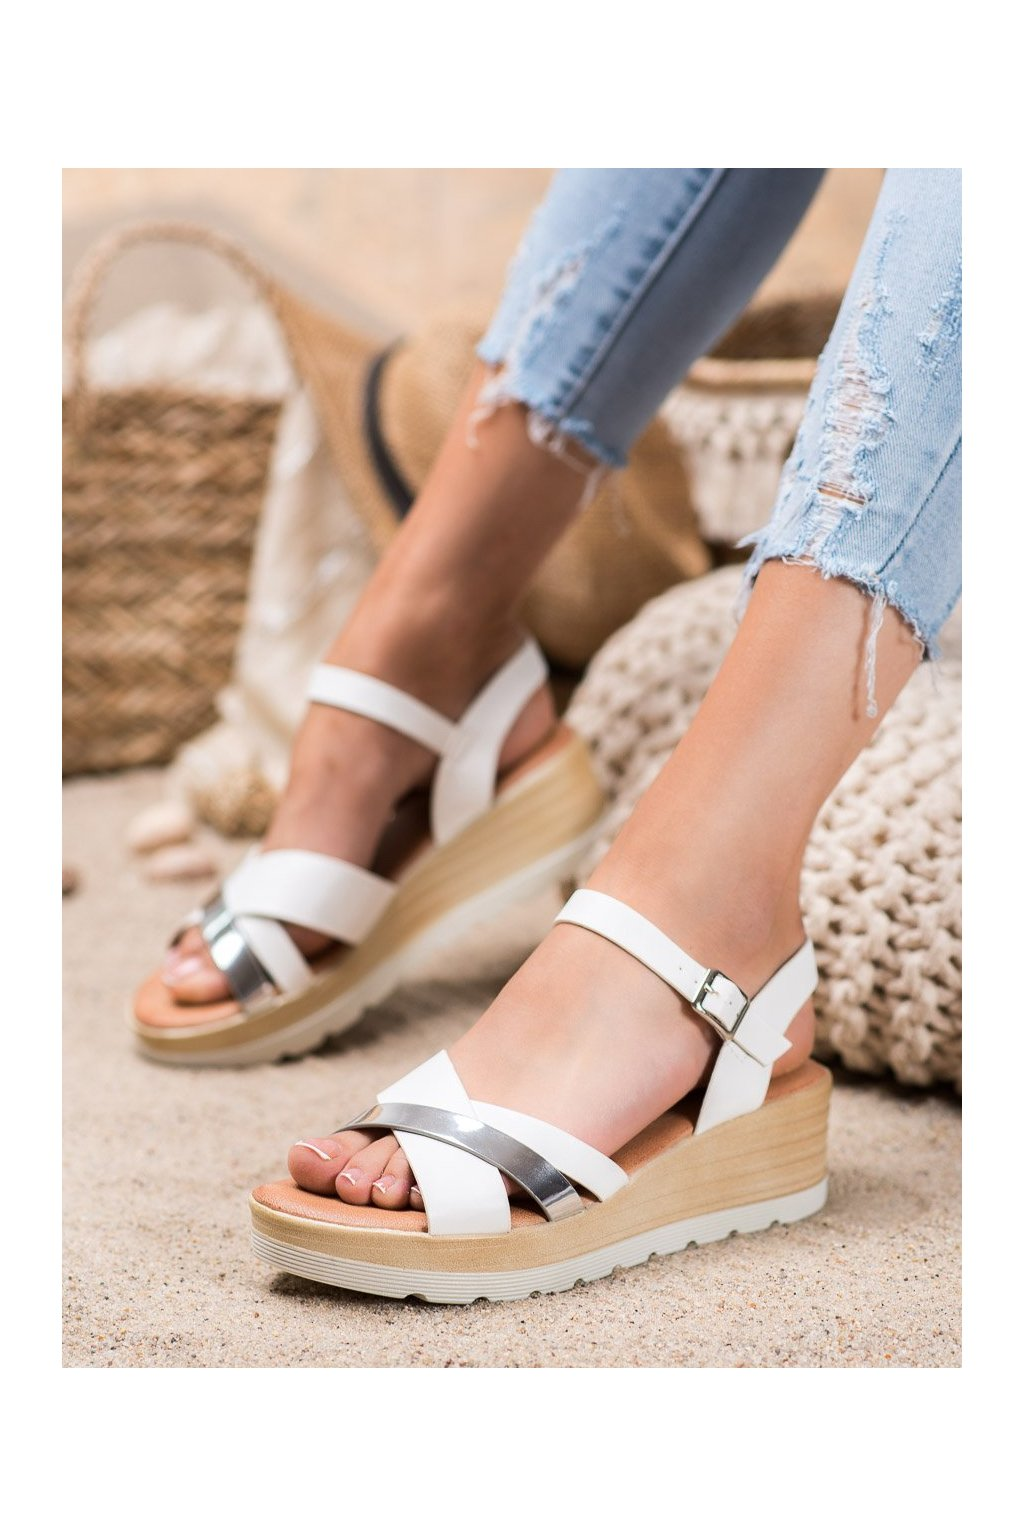 Biele sandále Renda kod BQ-35W